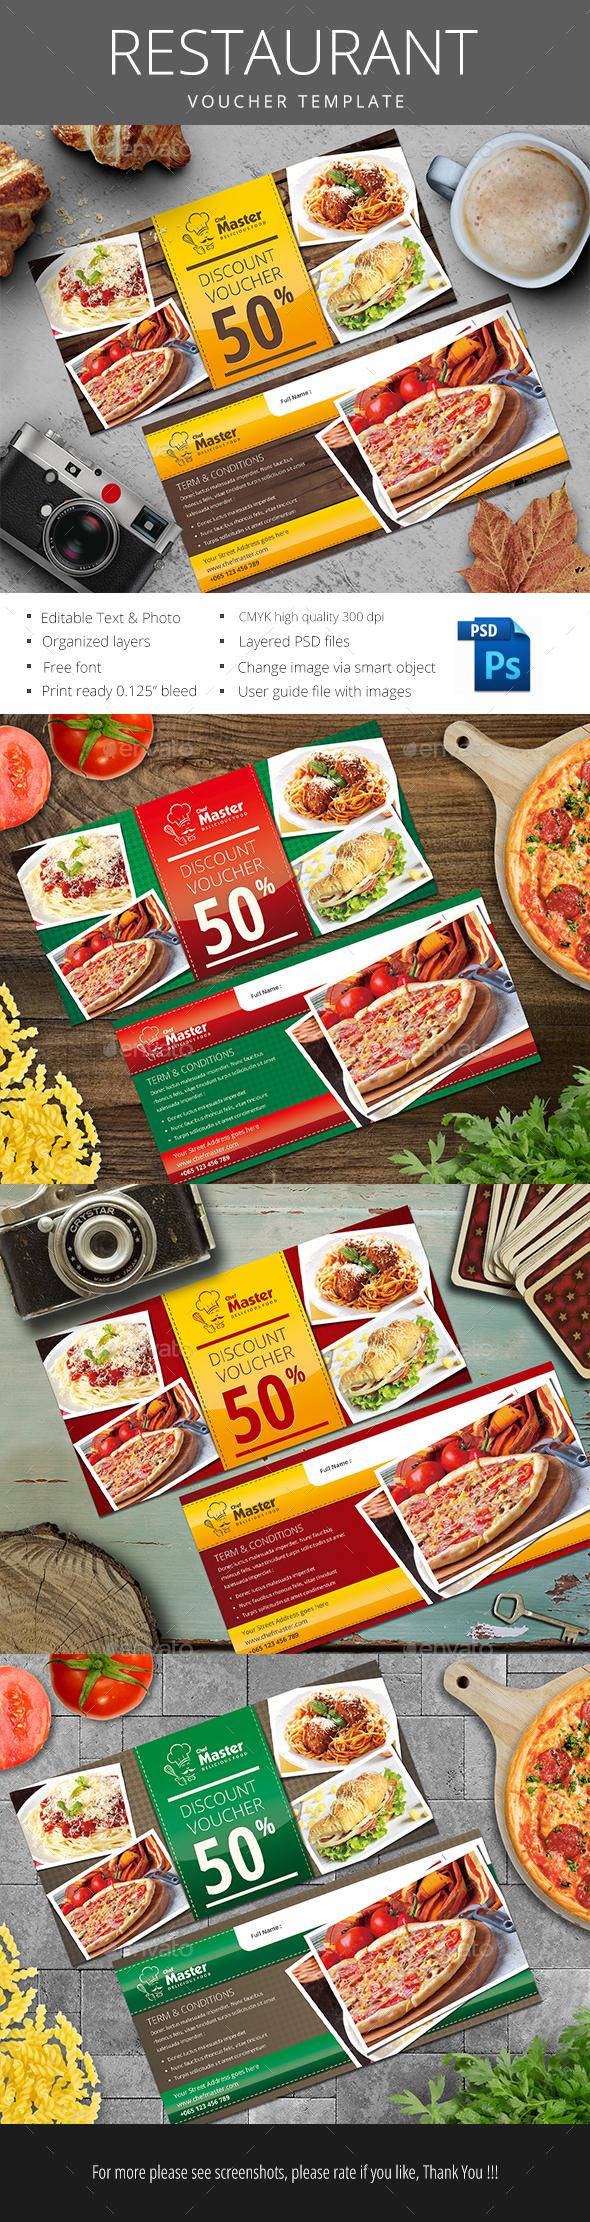 Restaurant Gift Voucher - Loyalty Cards Cards & Invites